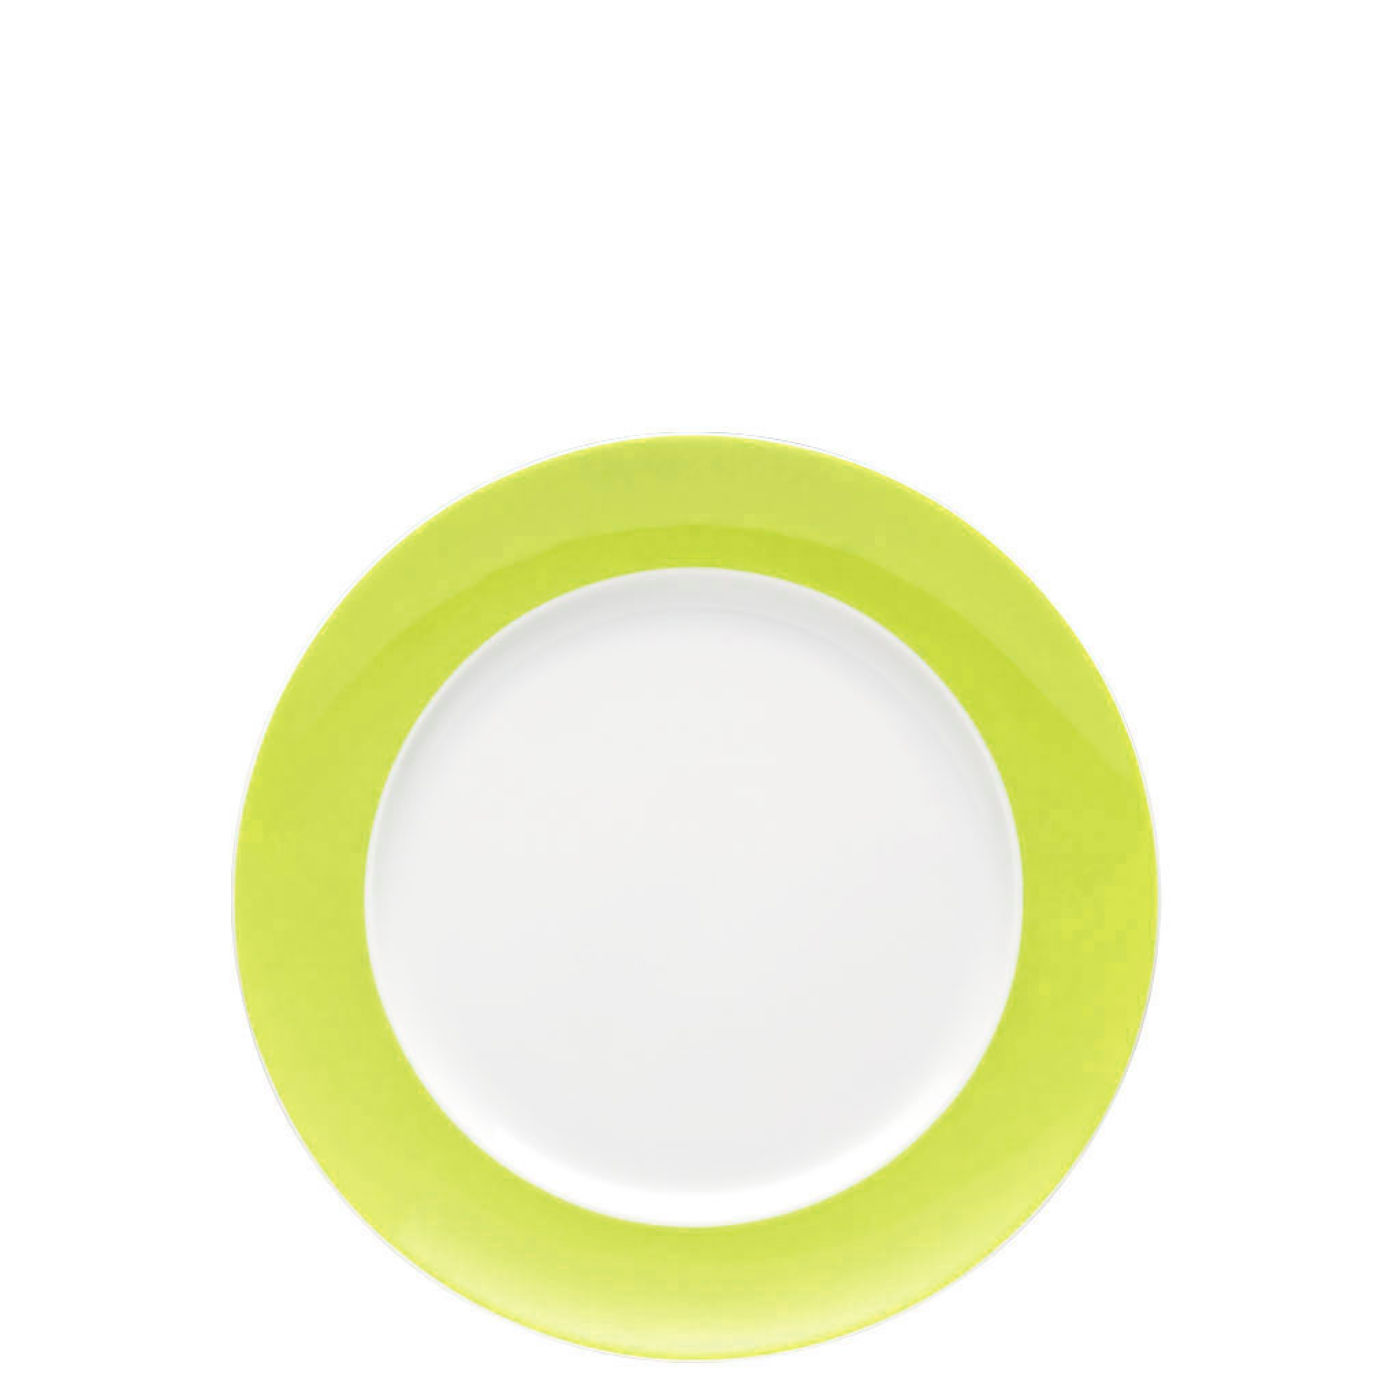 Набор столовый на 2 персоны Rosenthal SUNNY DAY, желтый, 10 предметов Rosenthal 10850-408535-28010 фото 3